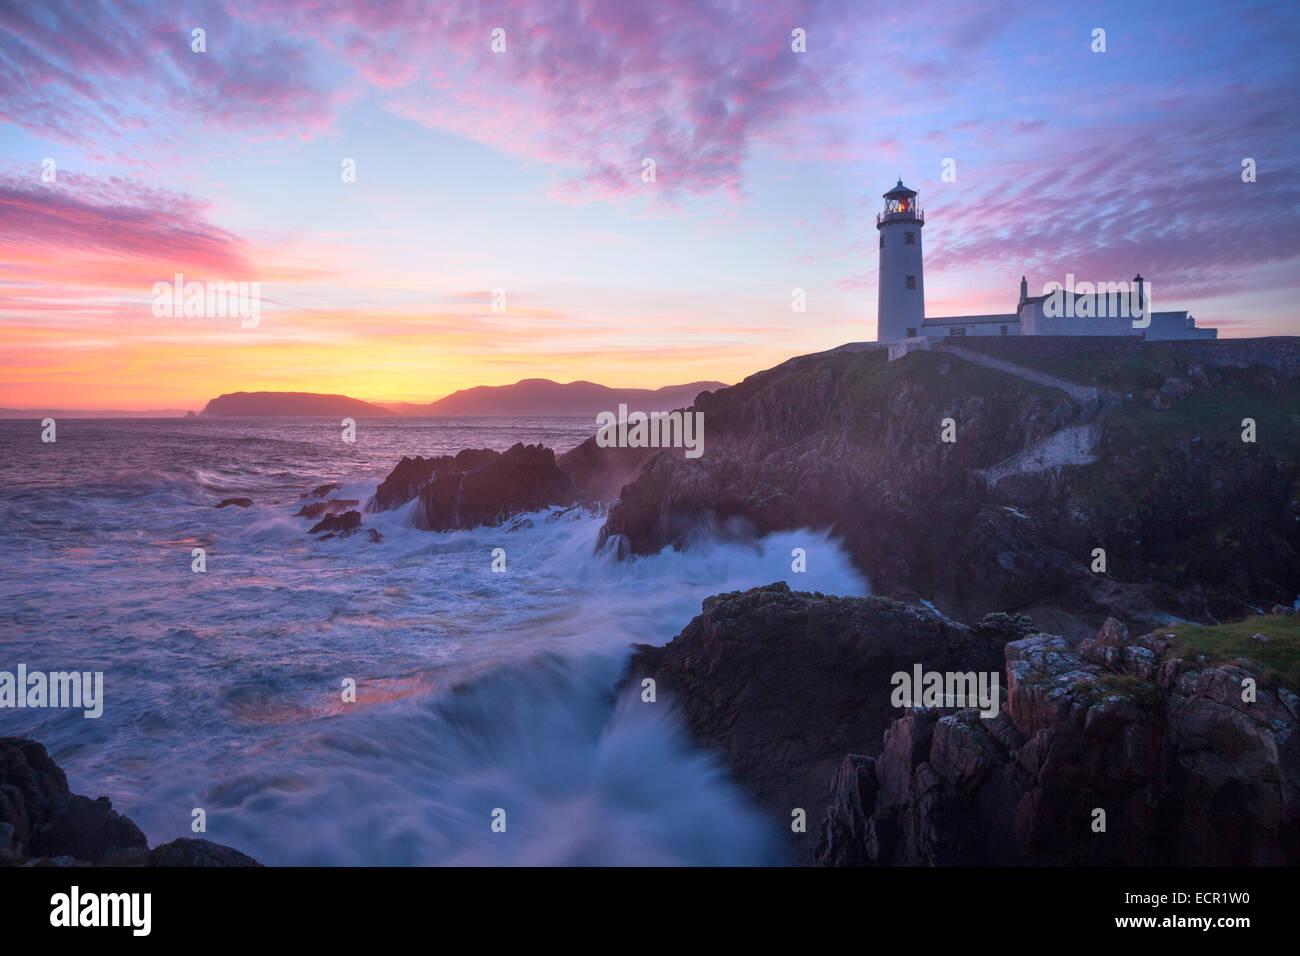 Sonnenaufgang über dem Fanad Head Leuchtturm Fanad Head, County Donegal, Irland. Stockfoto